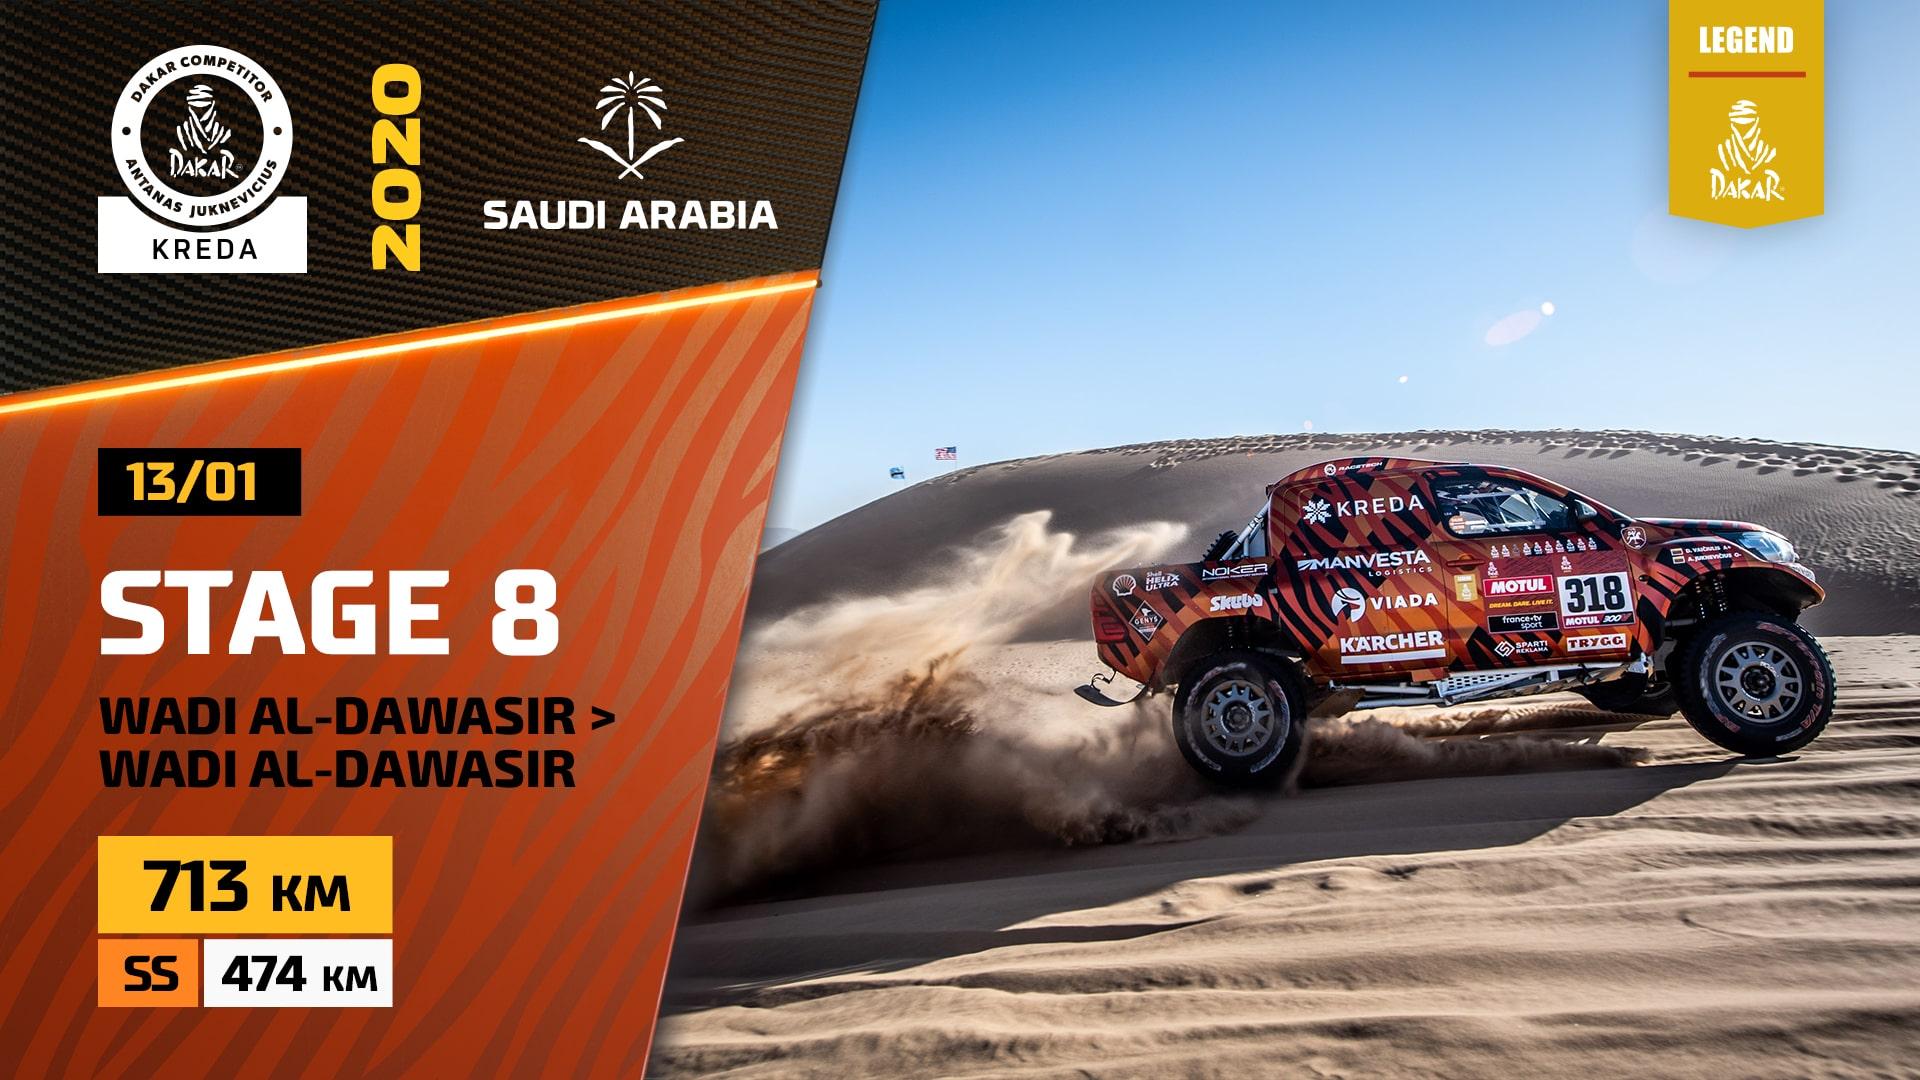 Dakar Rally 2020. Stage 8 Highlights Wadi Al-Dawasir – Wadi Al-Dawasir in Saudi Arabia